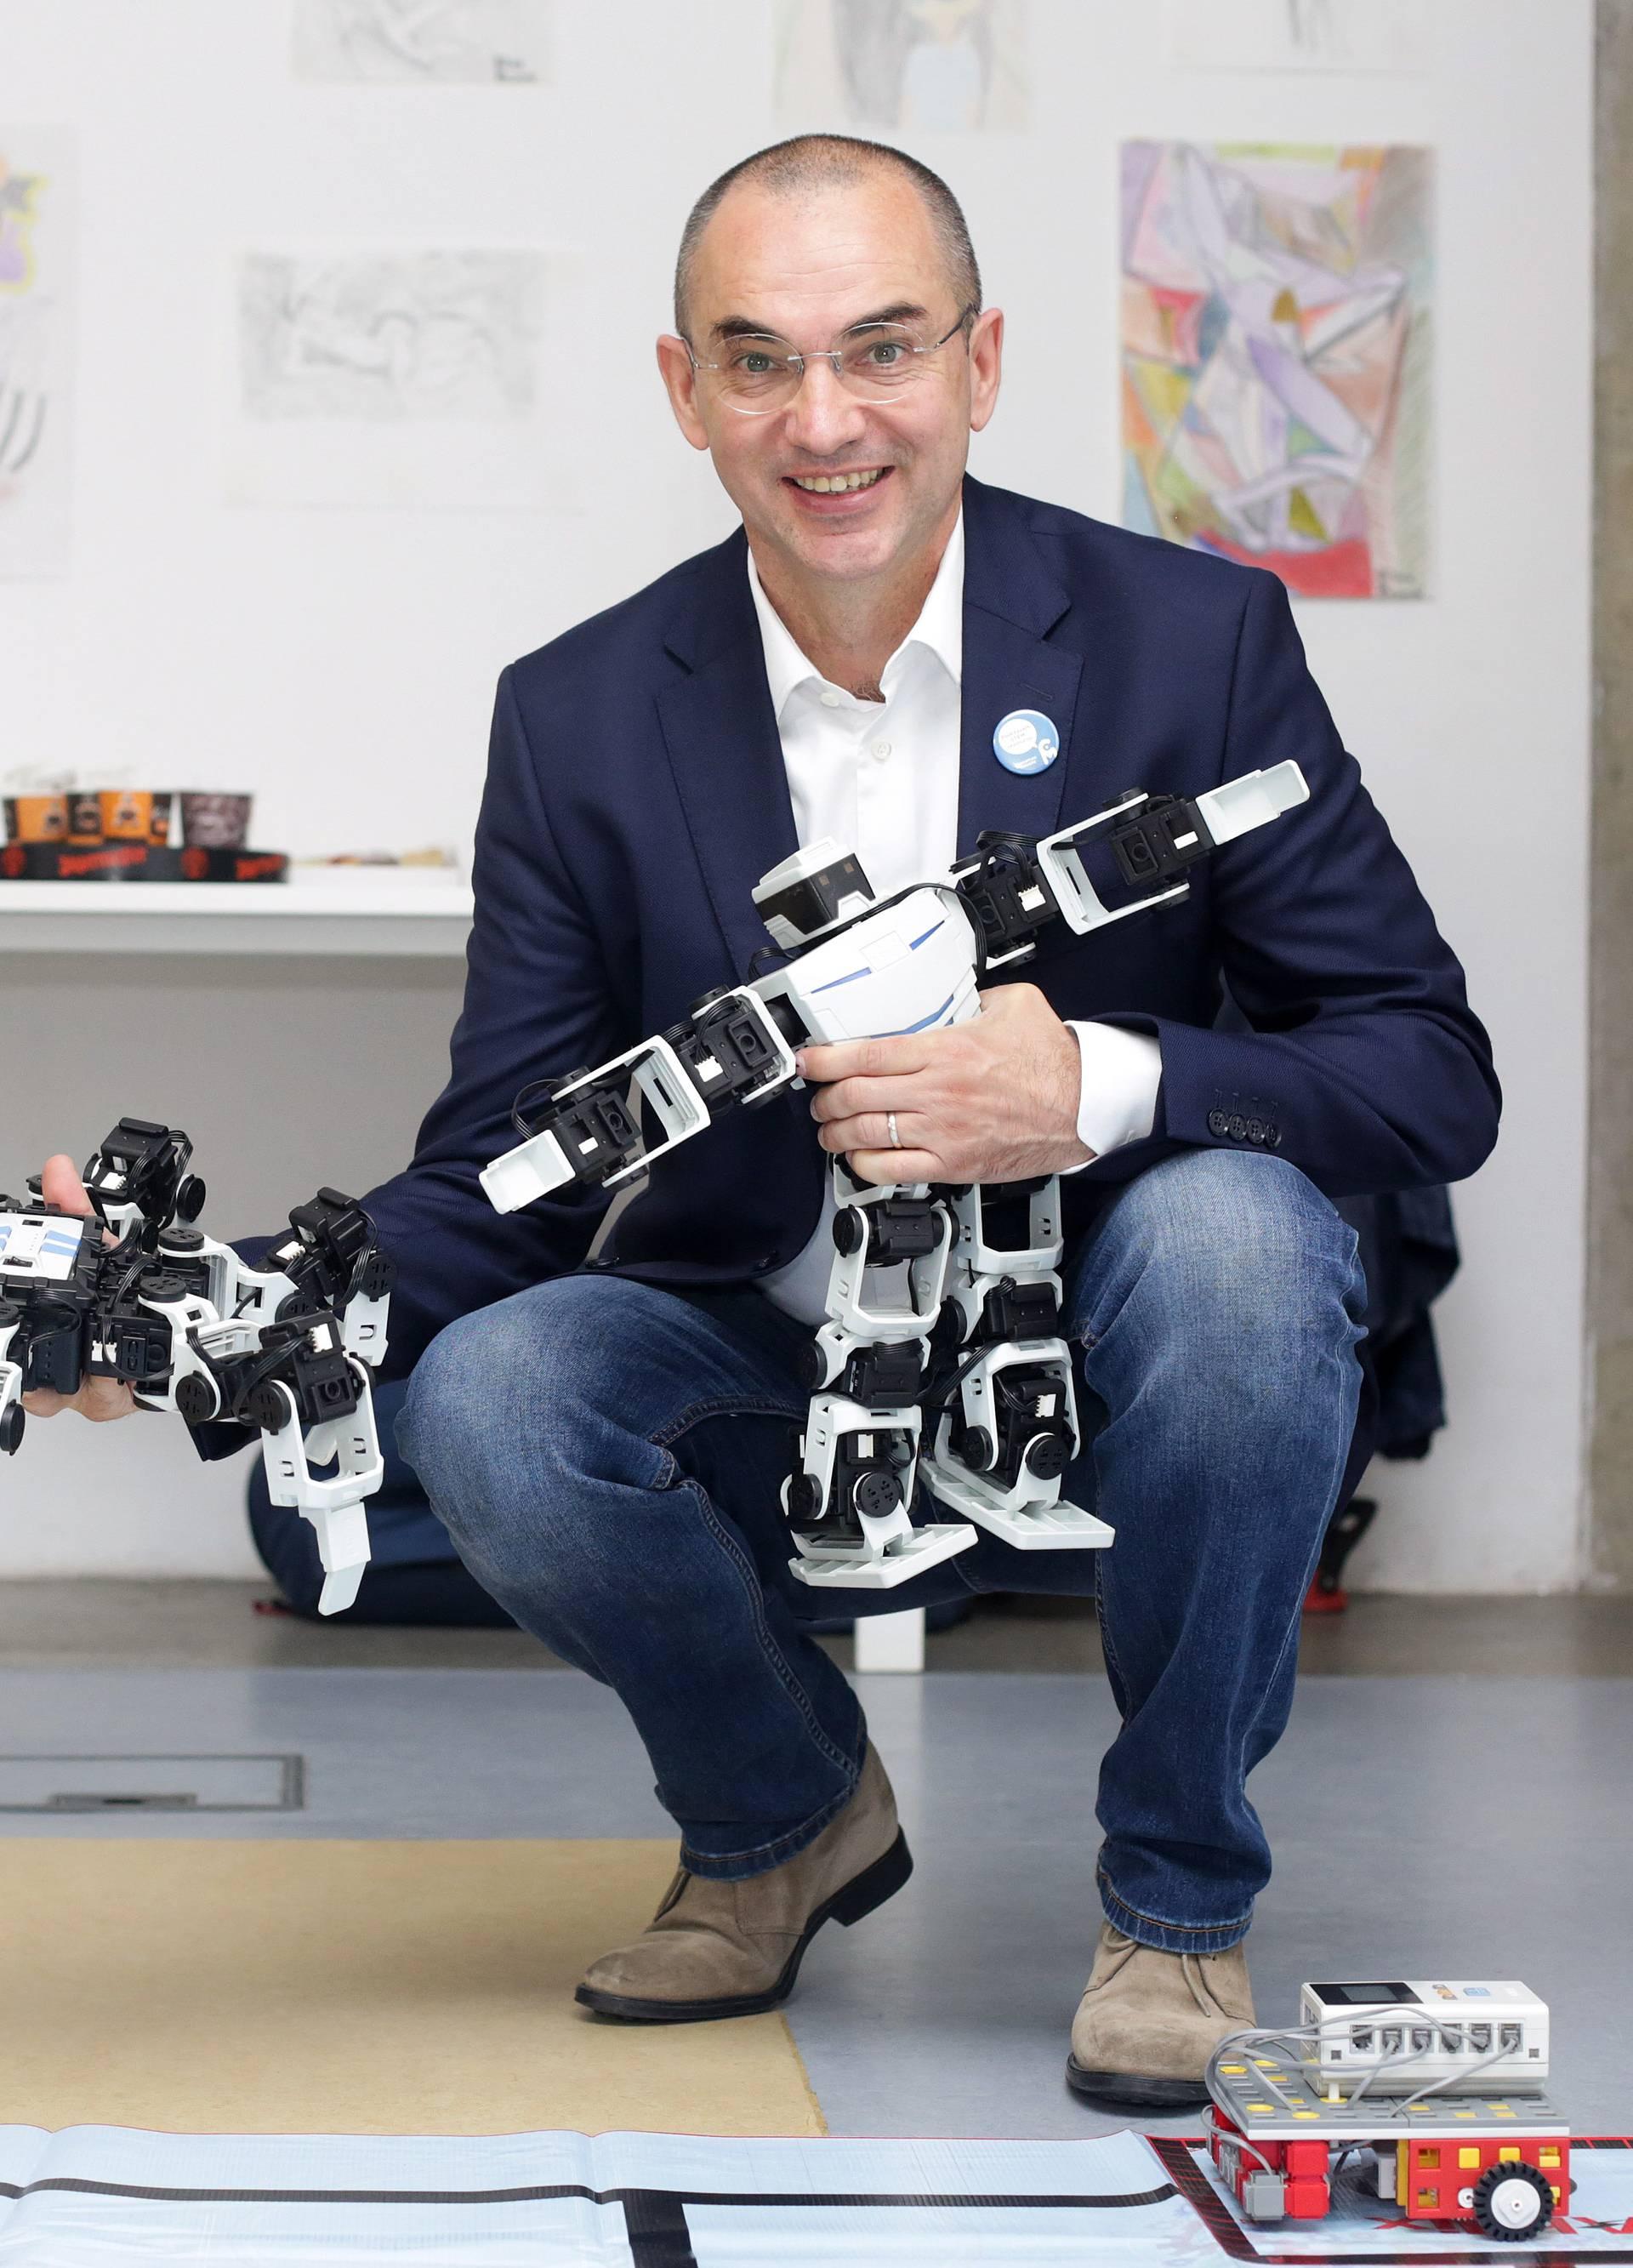 Nenad Bakić jedan je od sto digitalnih šampiona u Europi